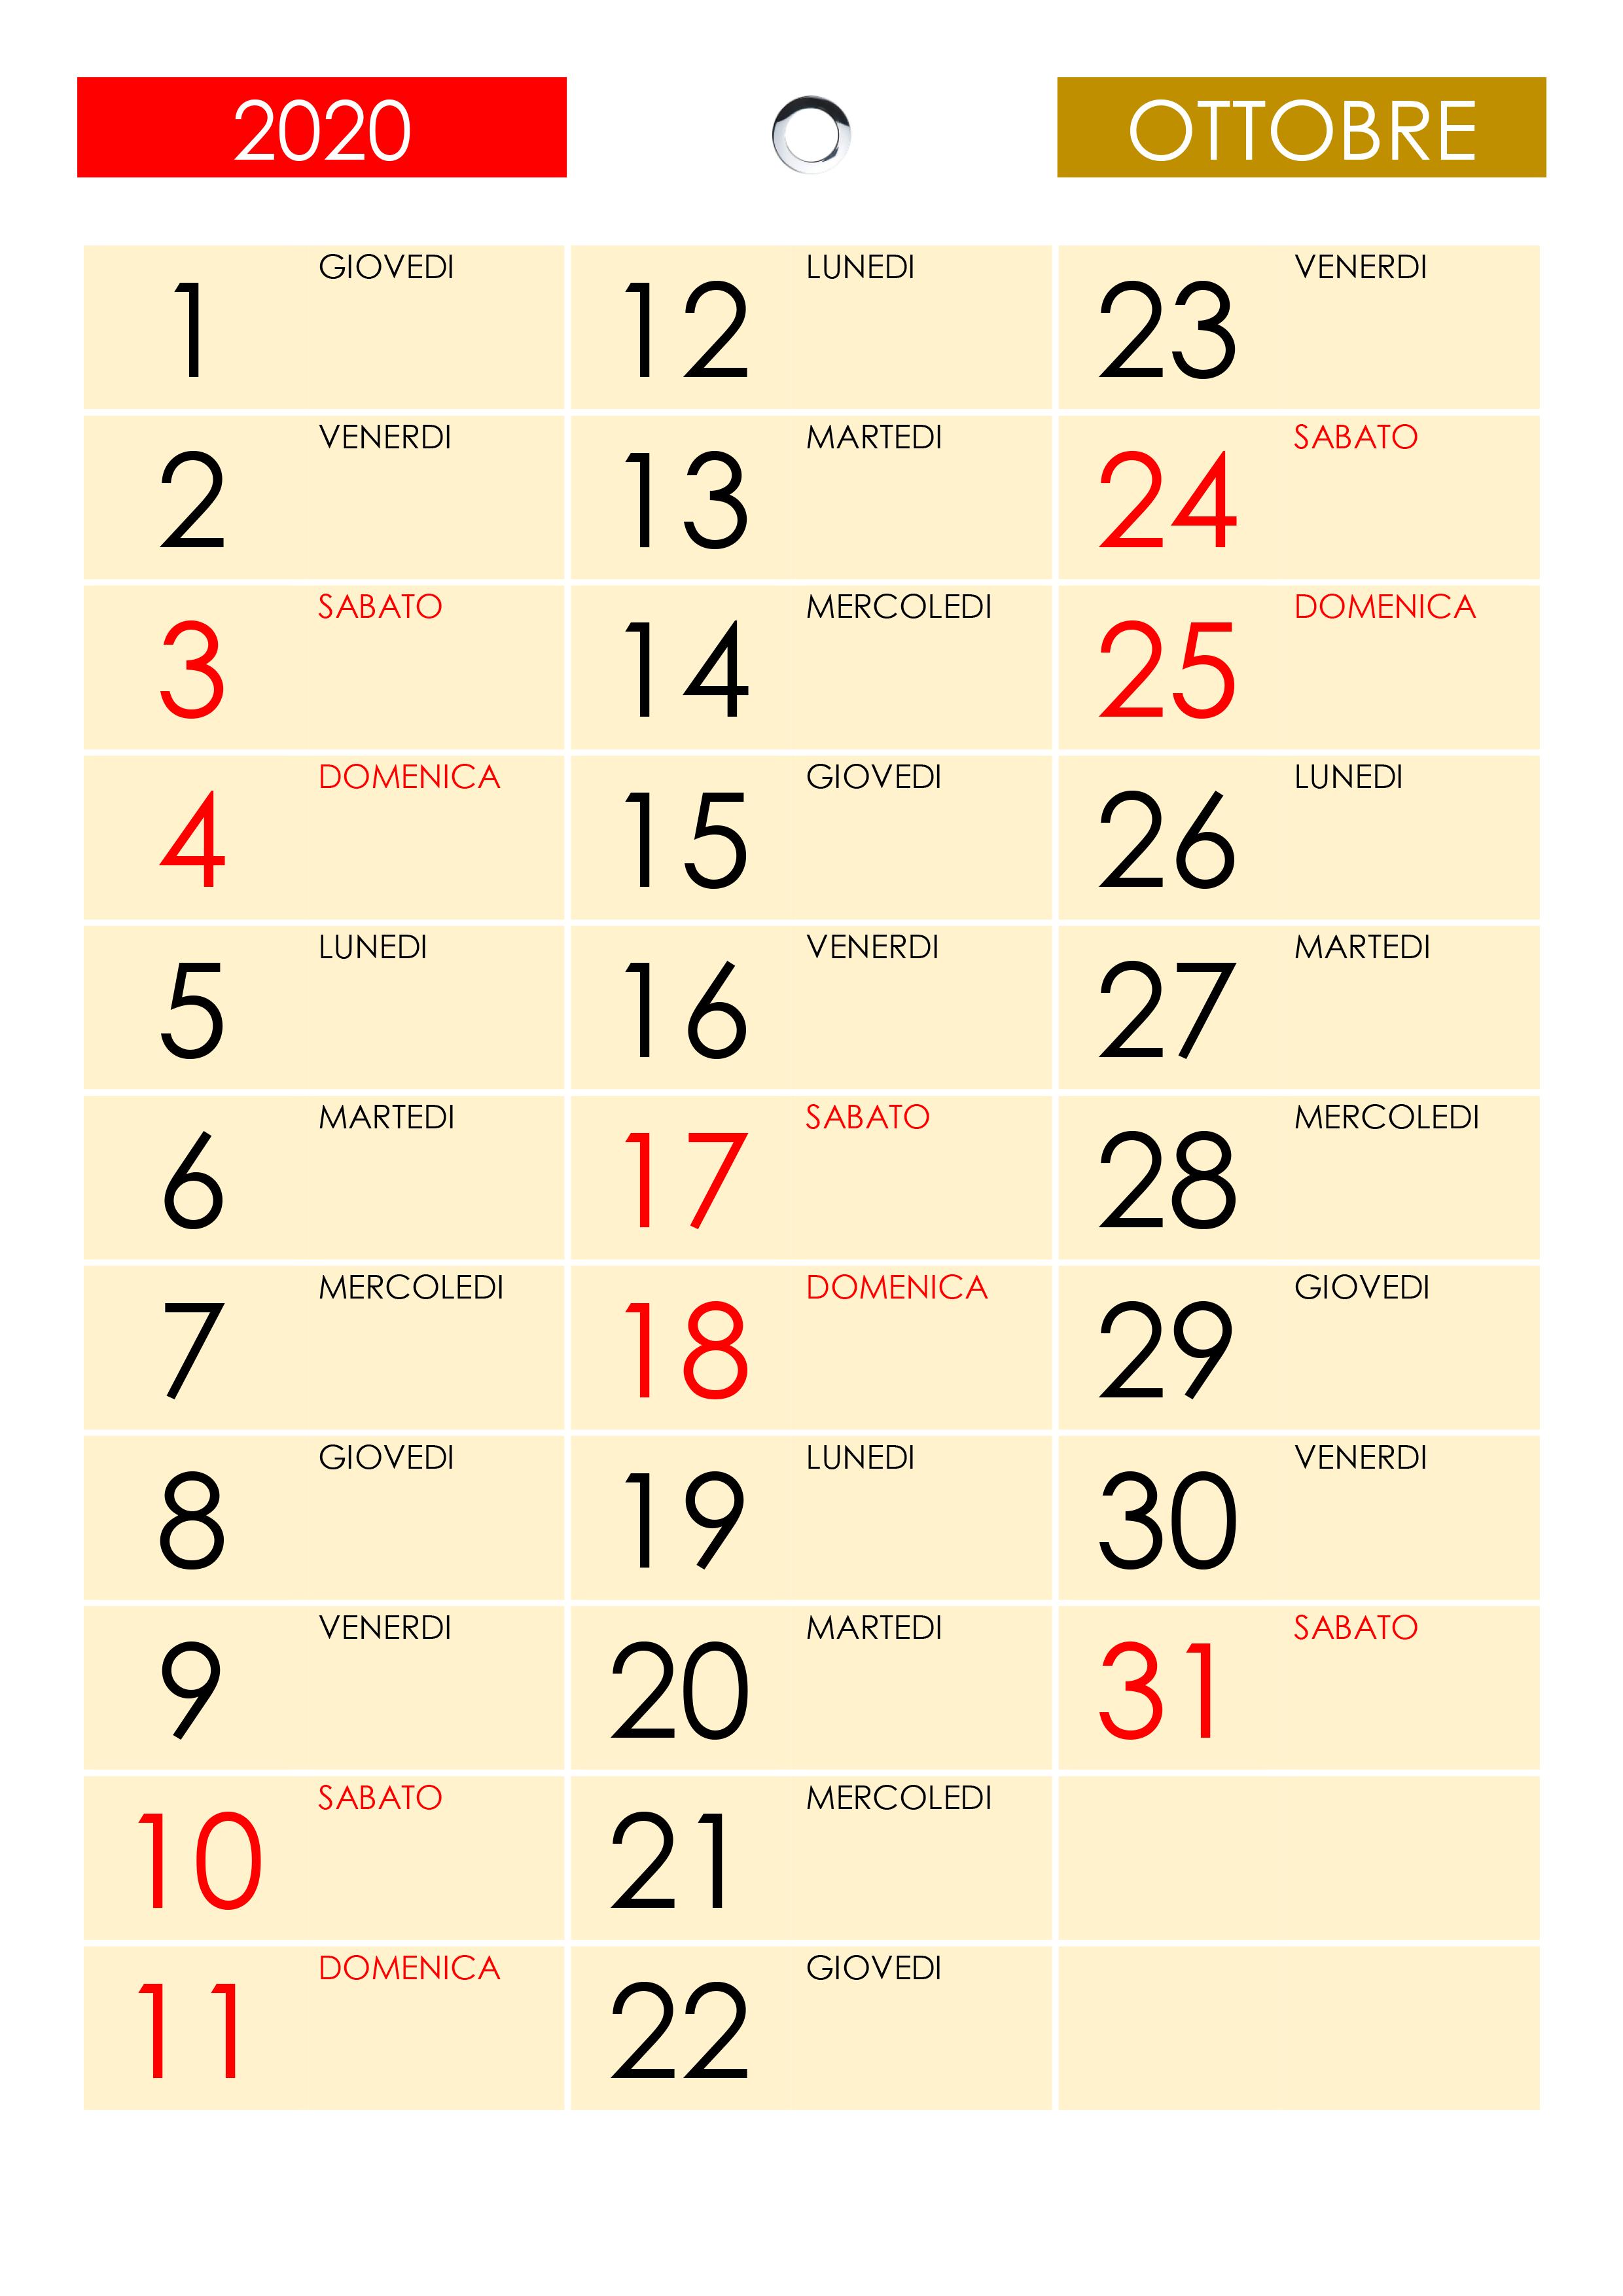 Anno Calendario 2020.Calendario Ottobre 2020 Calendario Su